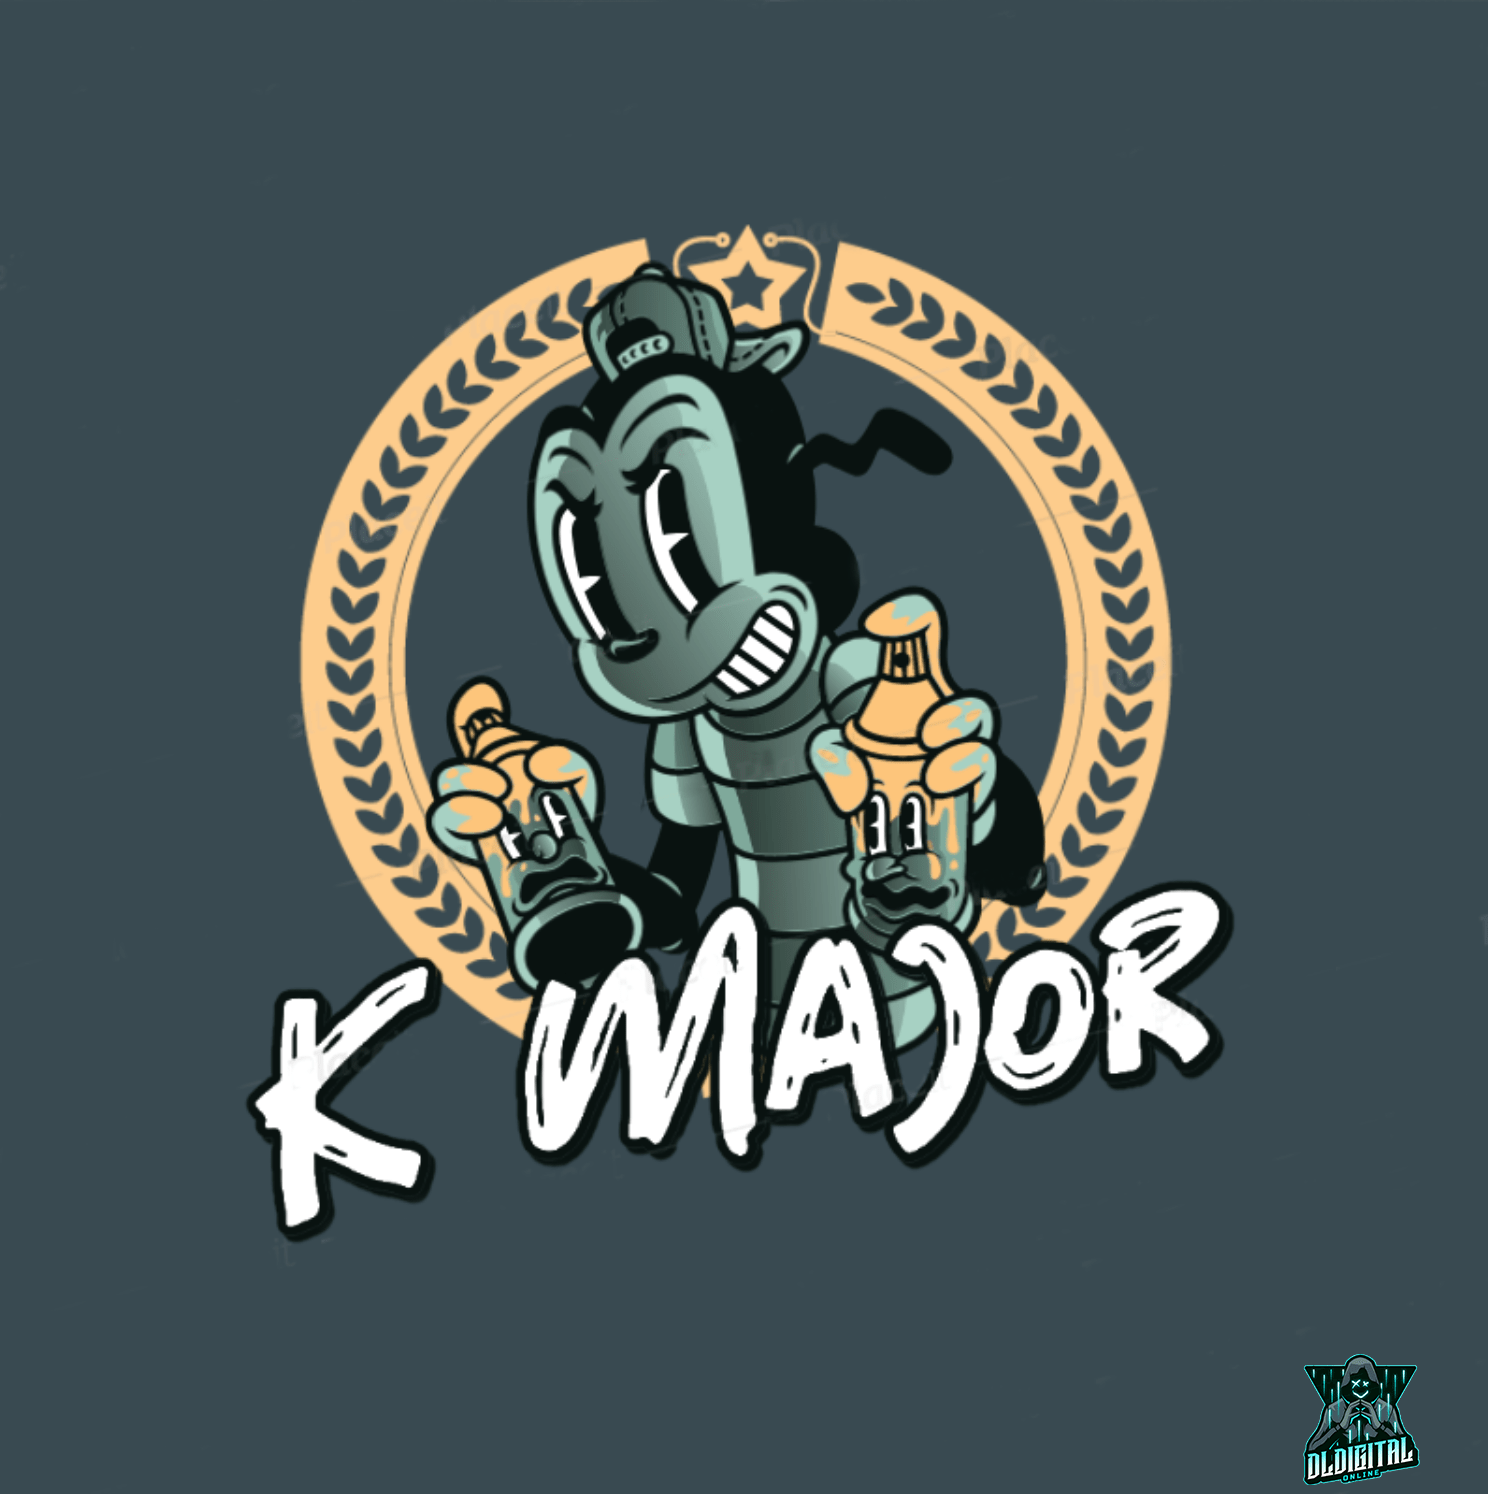 k-major logo design